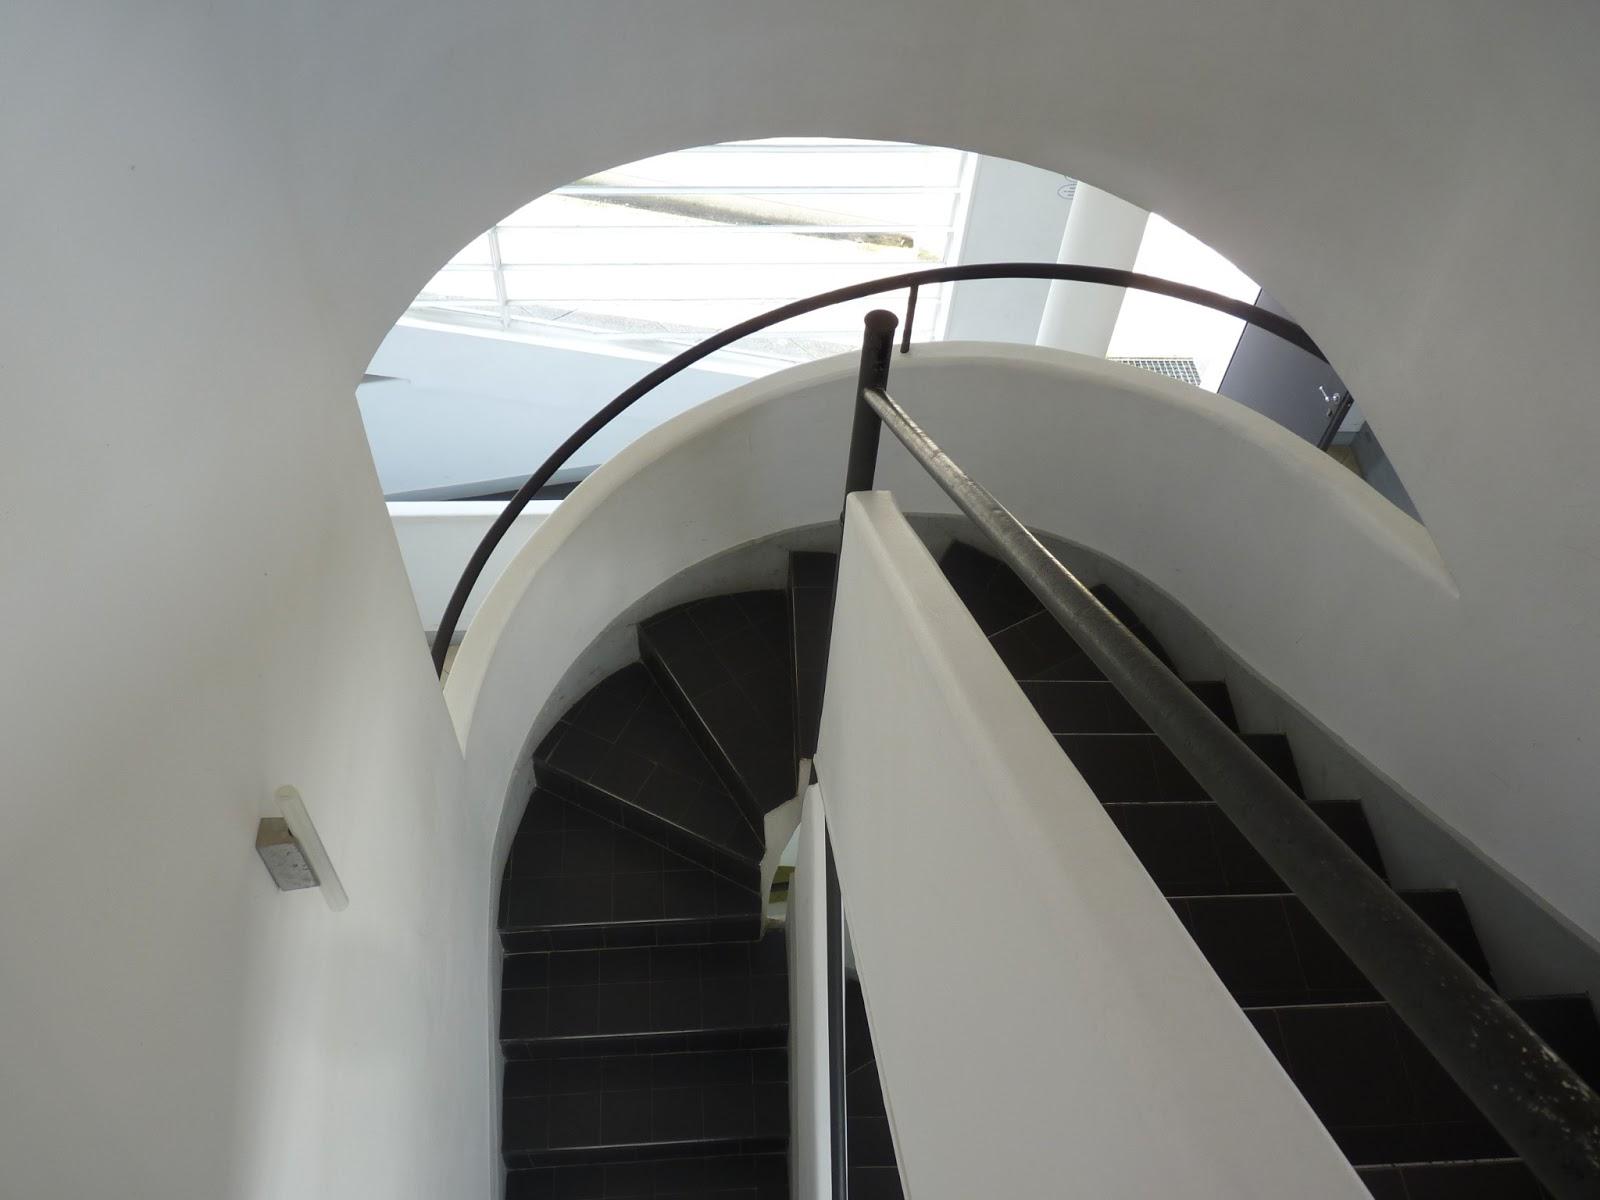 kulturrama architecture et lumi re la villa savoye du corbusier. Black Bedroom Furniture Sets. Home Design Ideas